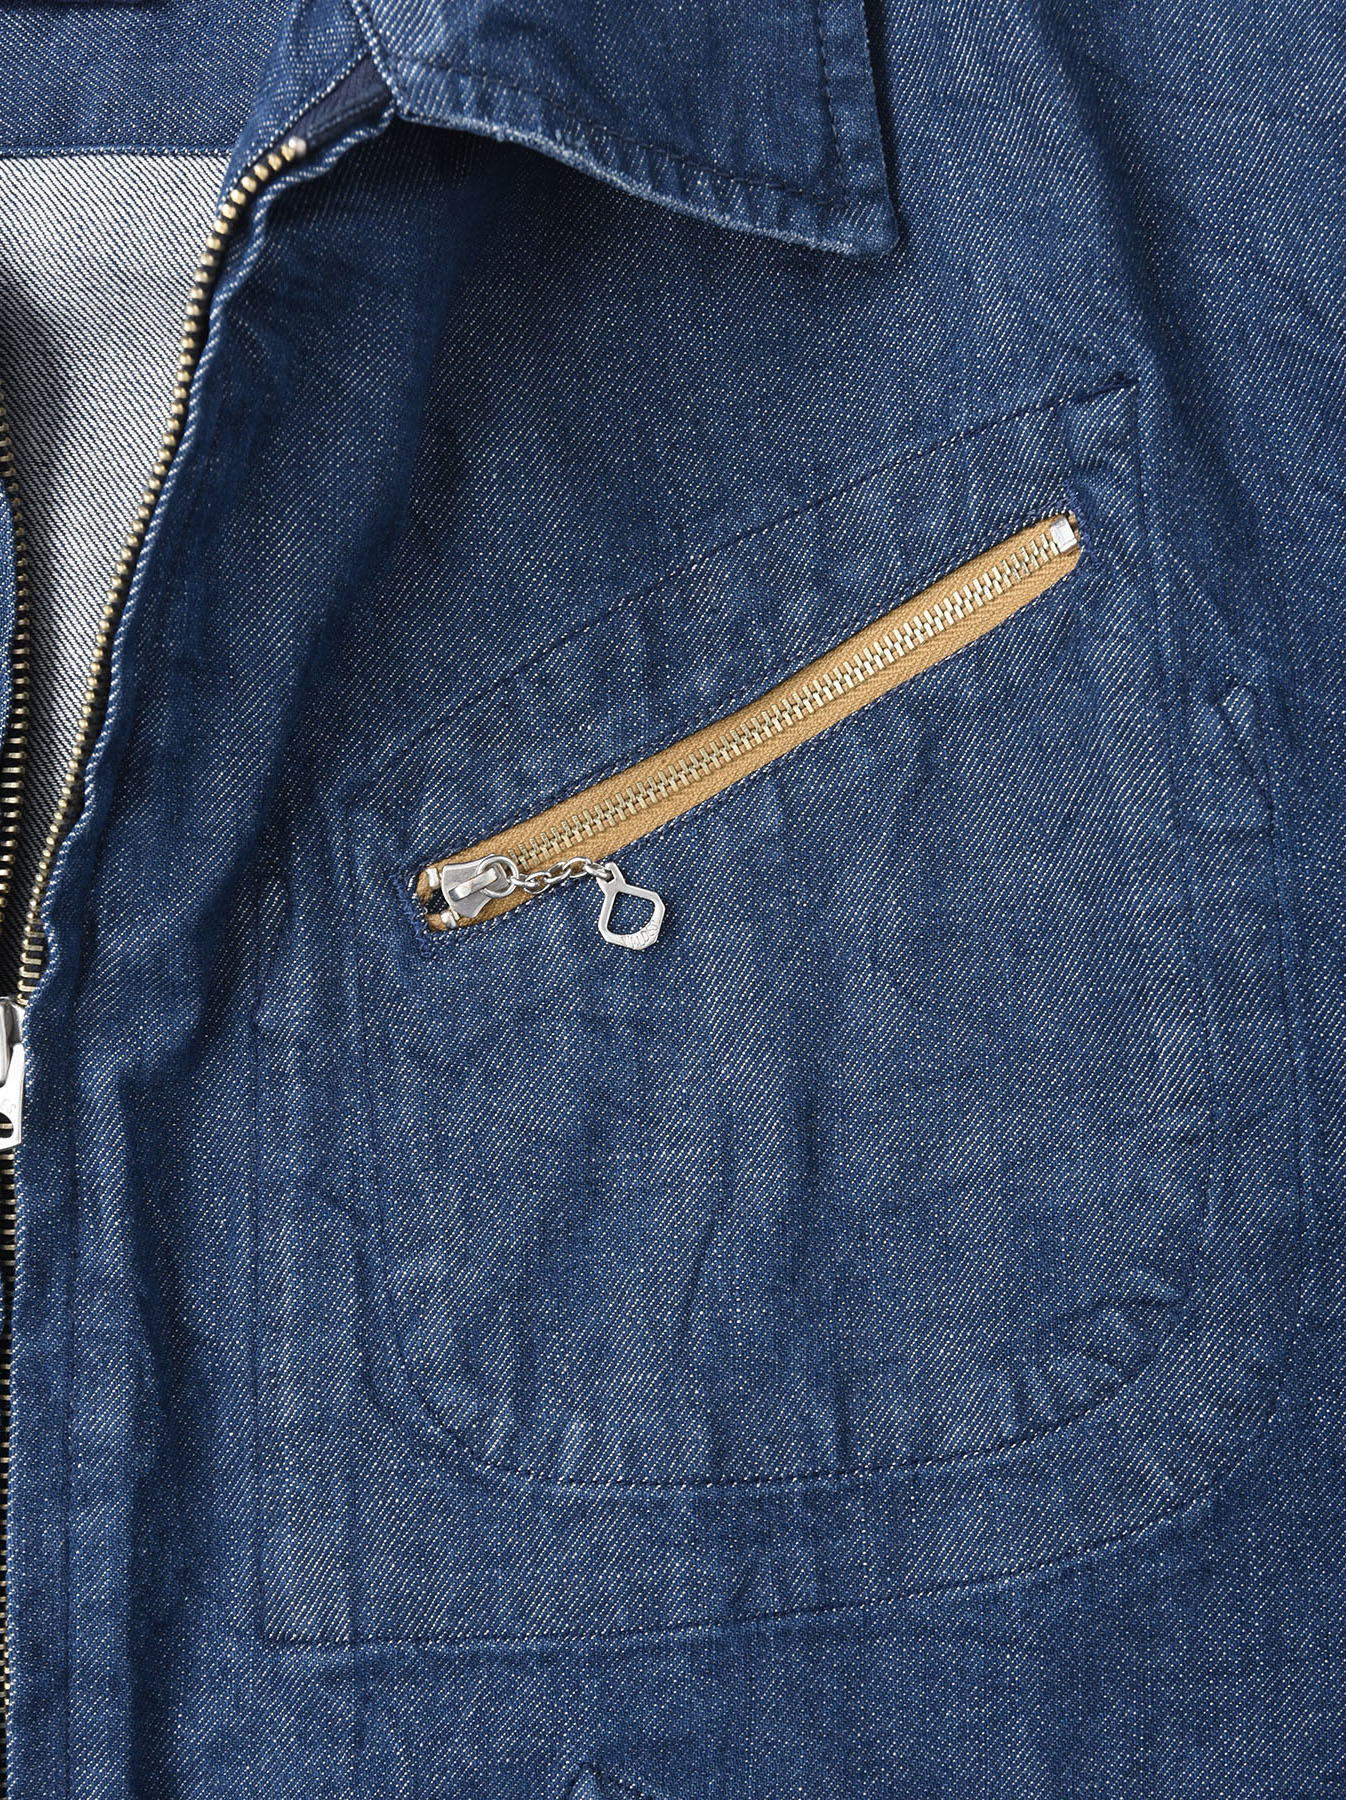 Distressed Mugi Denim Jacket-8